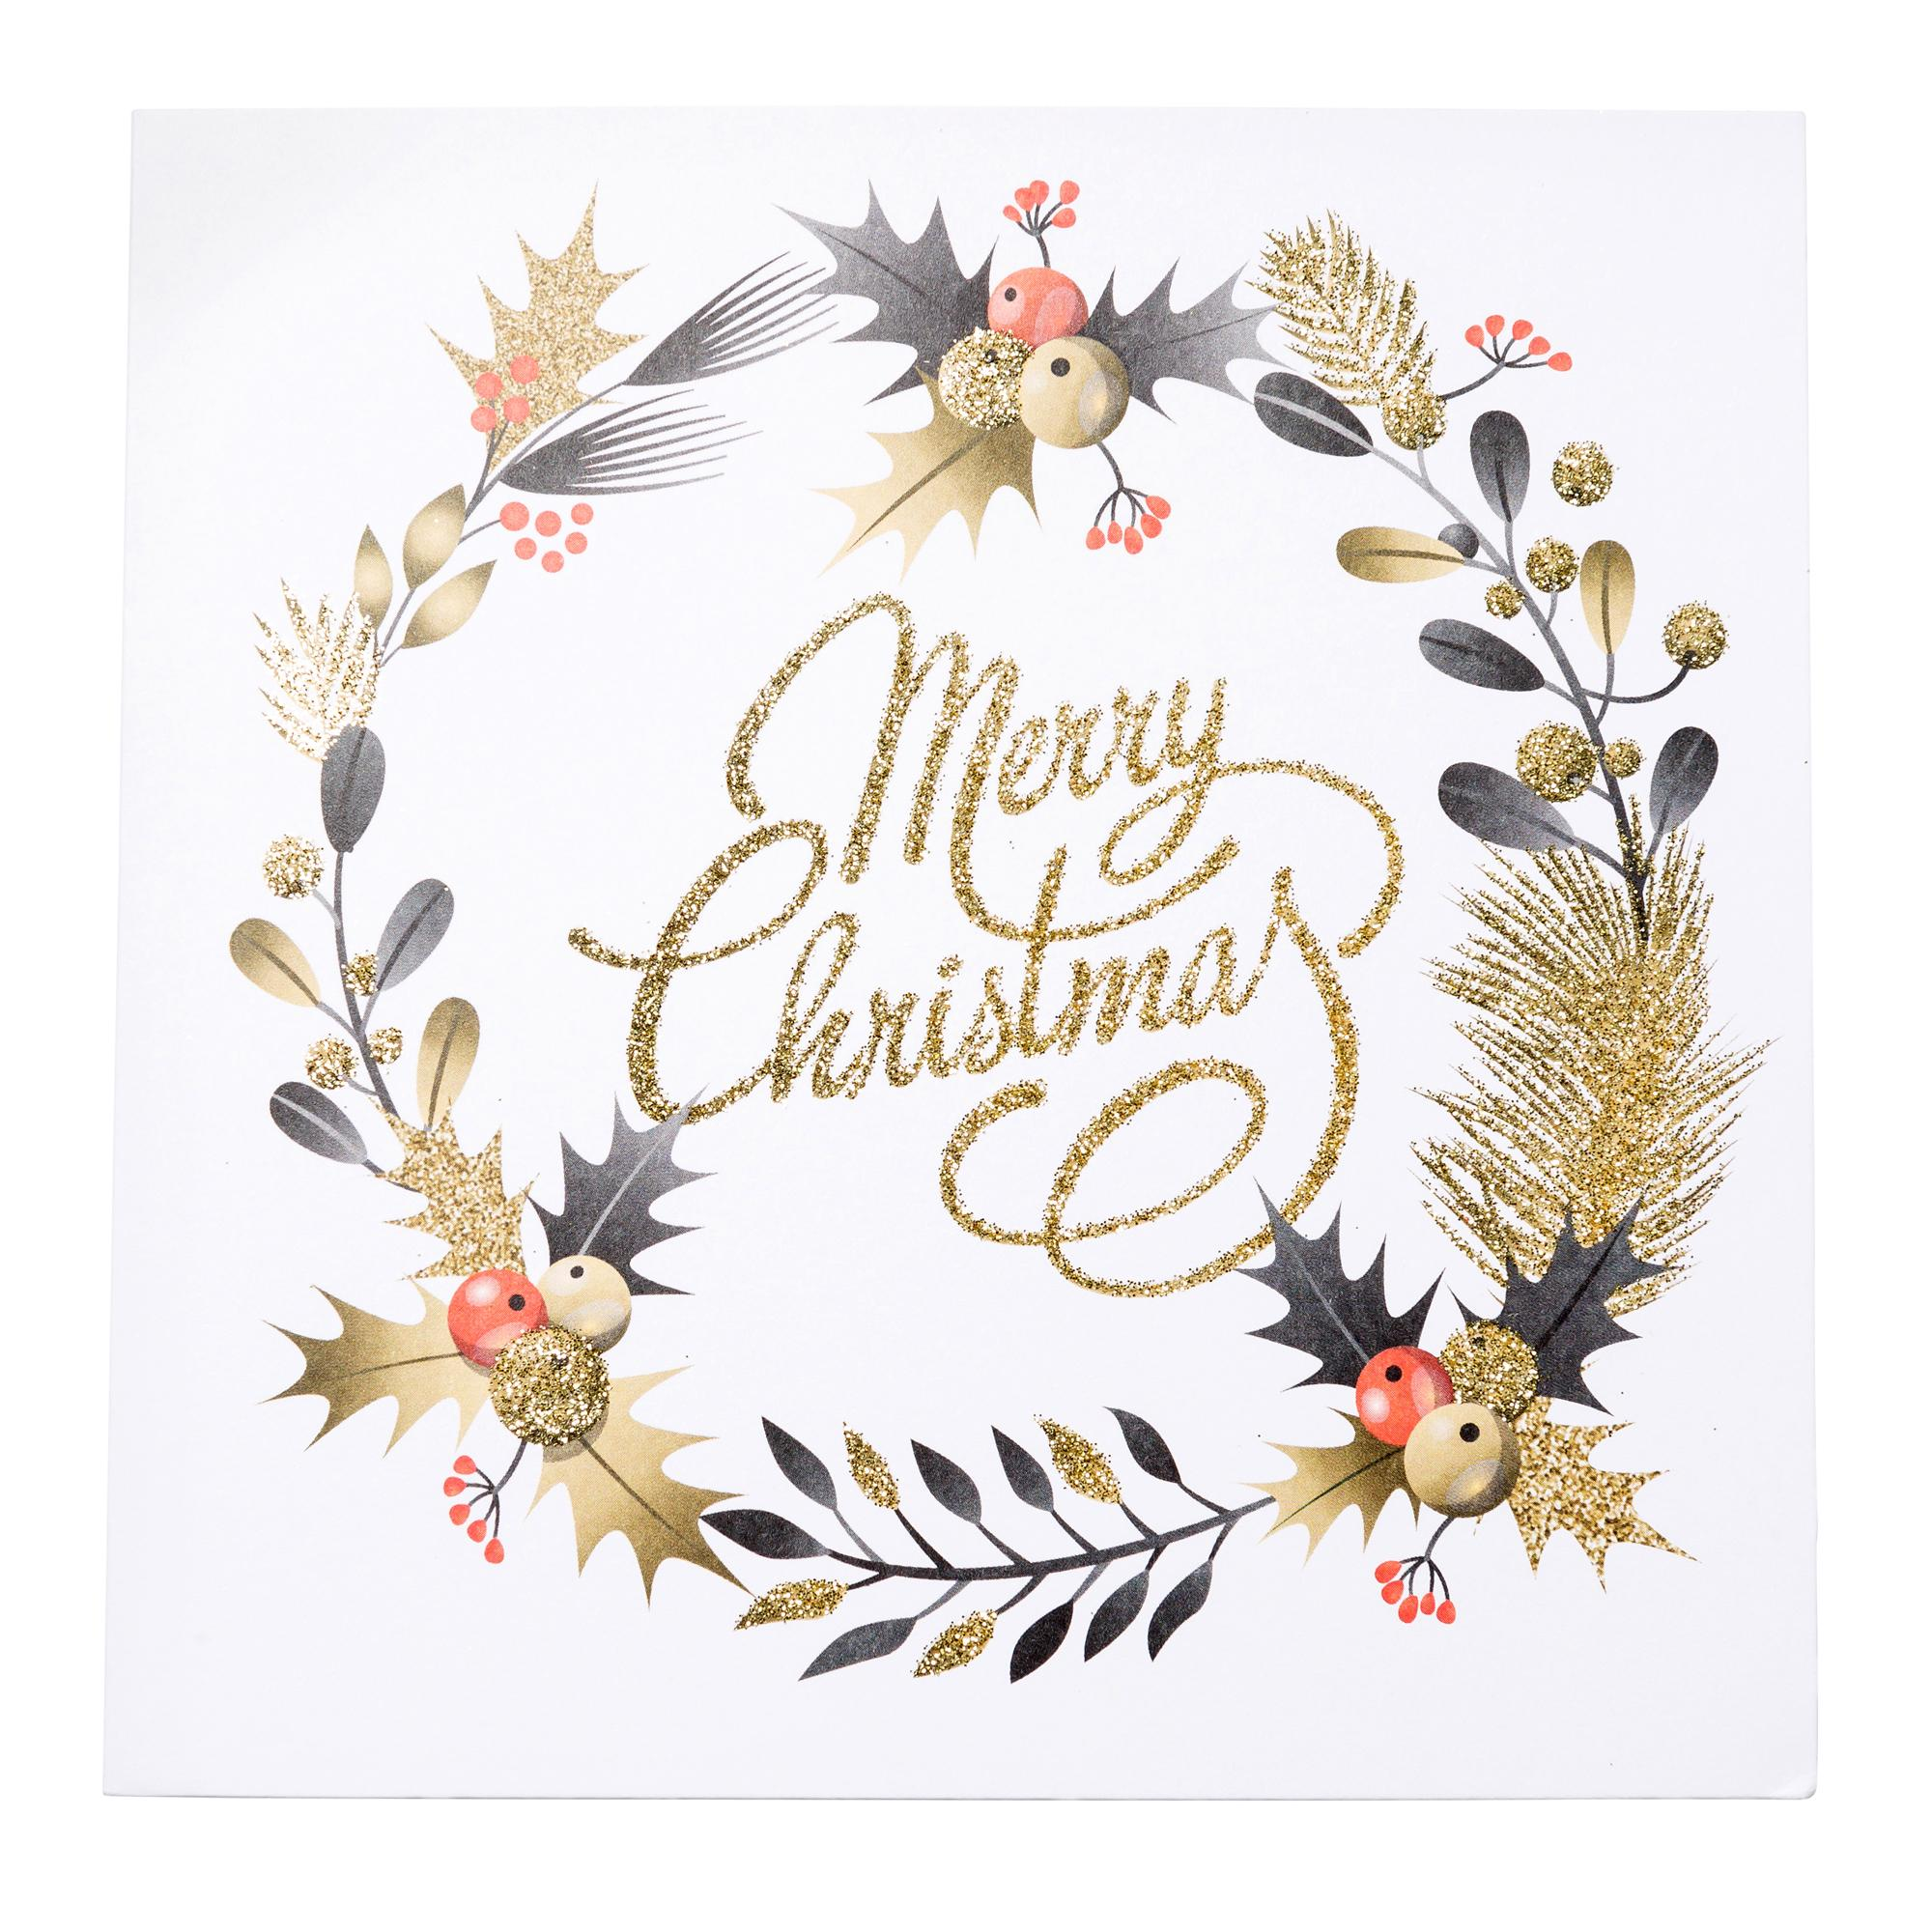 Glitter Christmas Cards.Gold Glitter Festive Wreath Christmas Cards Pack Of 20